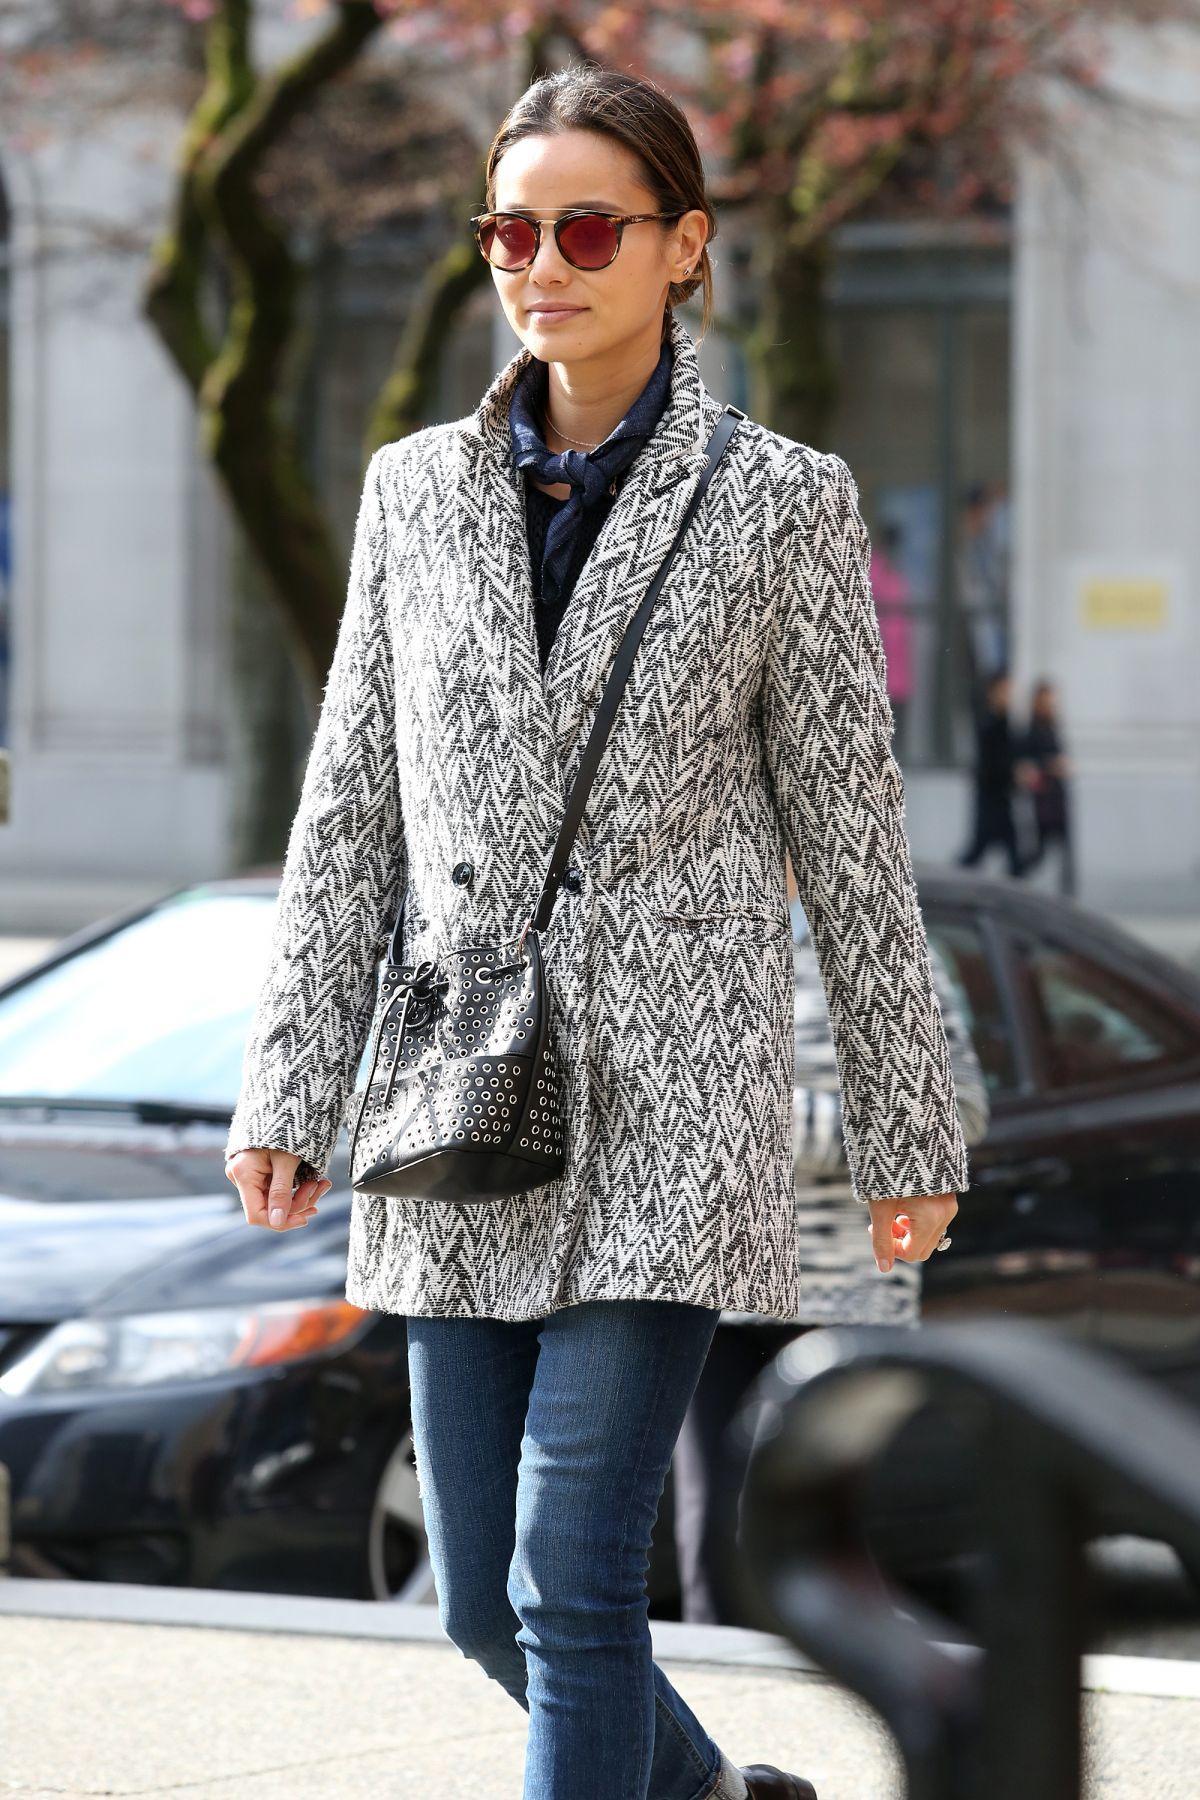 Jamie Chung's coat